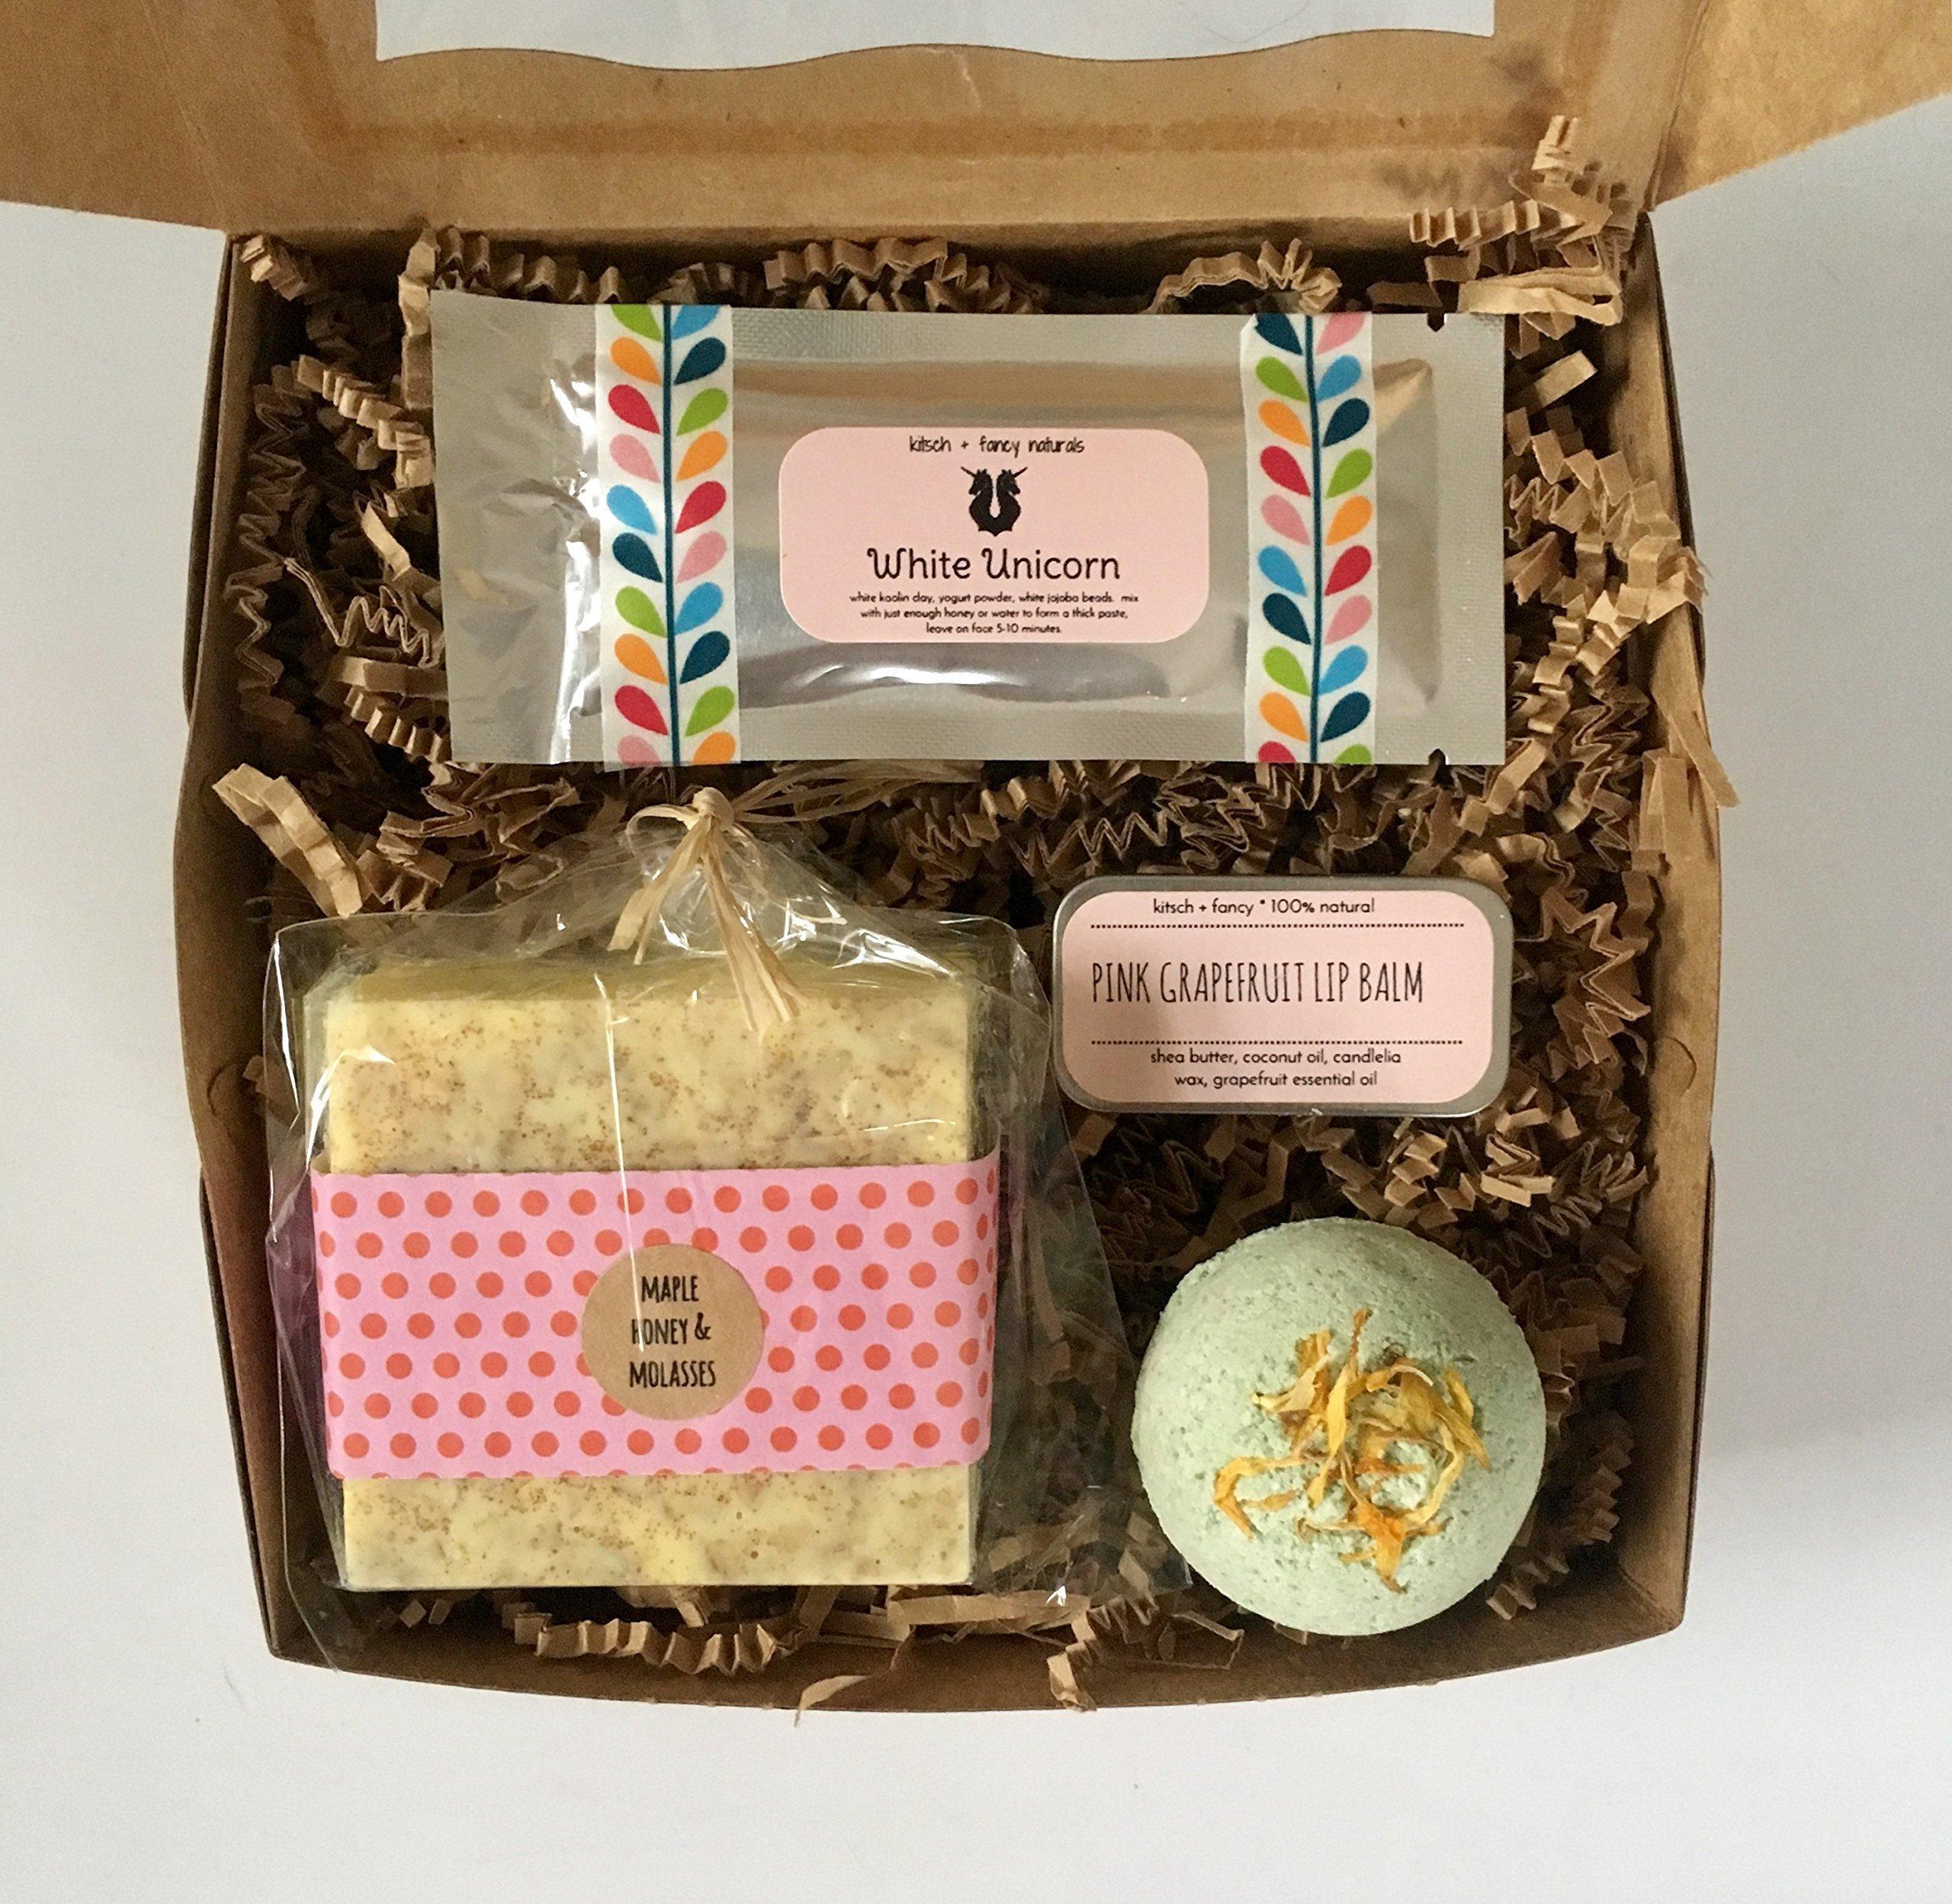 Spa Gift Box: includes handmade soap bar, bath bomb, lip balm, and face mask